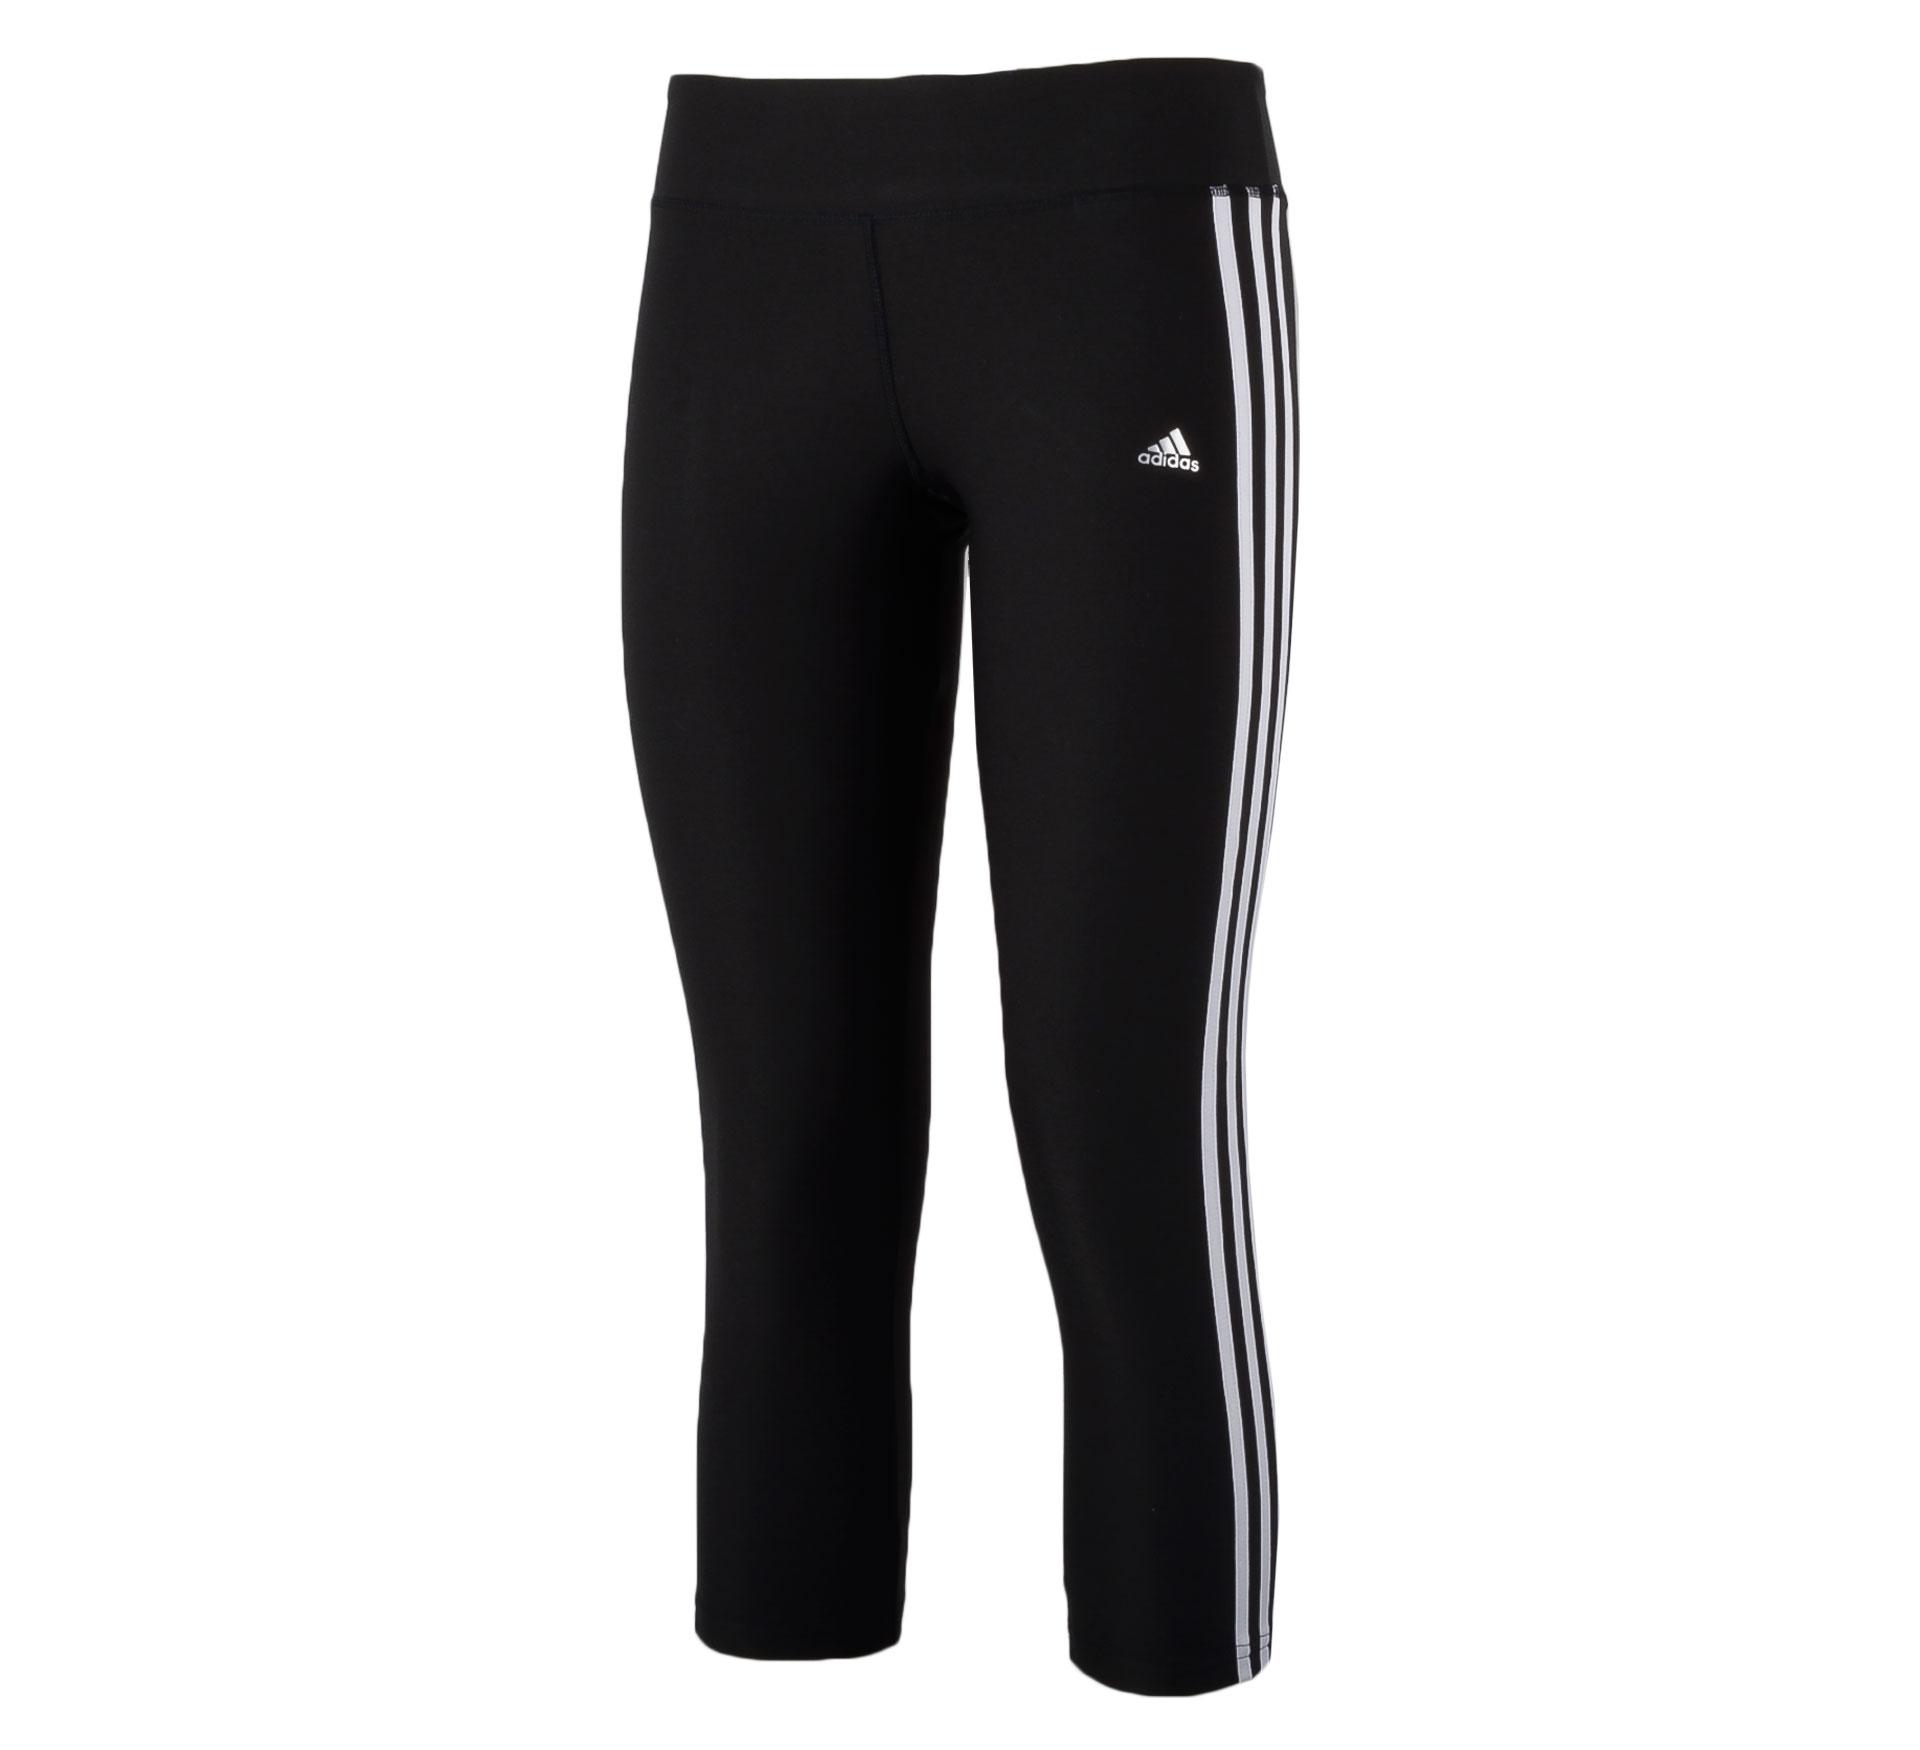 Adidas Ultimate Fit 3Stripe 3/4 Tight Dames zwart - wit